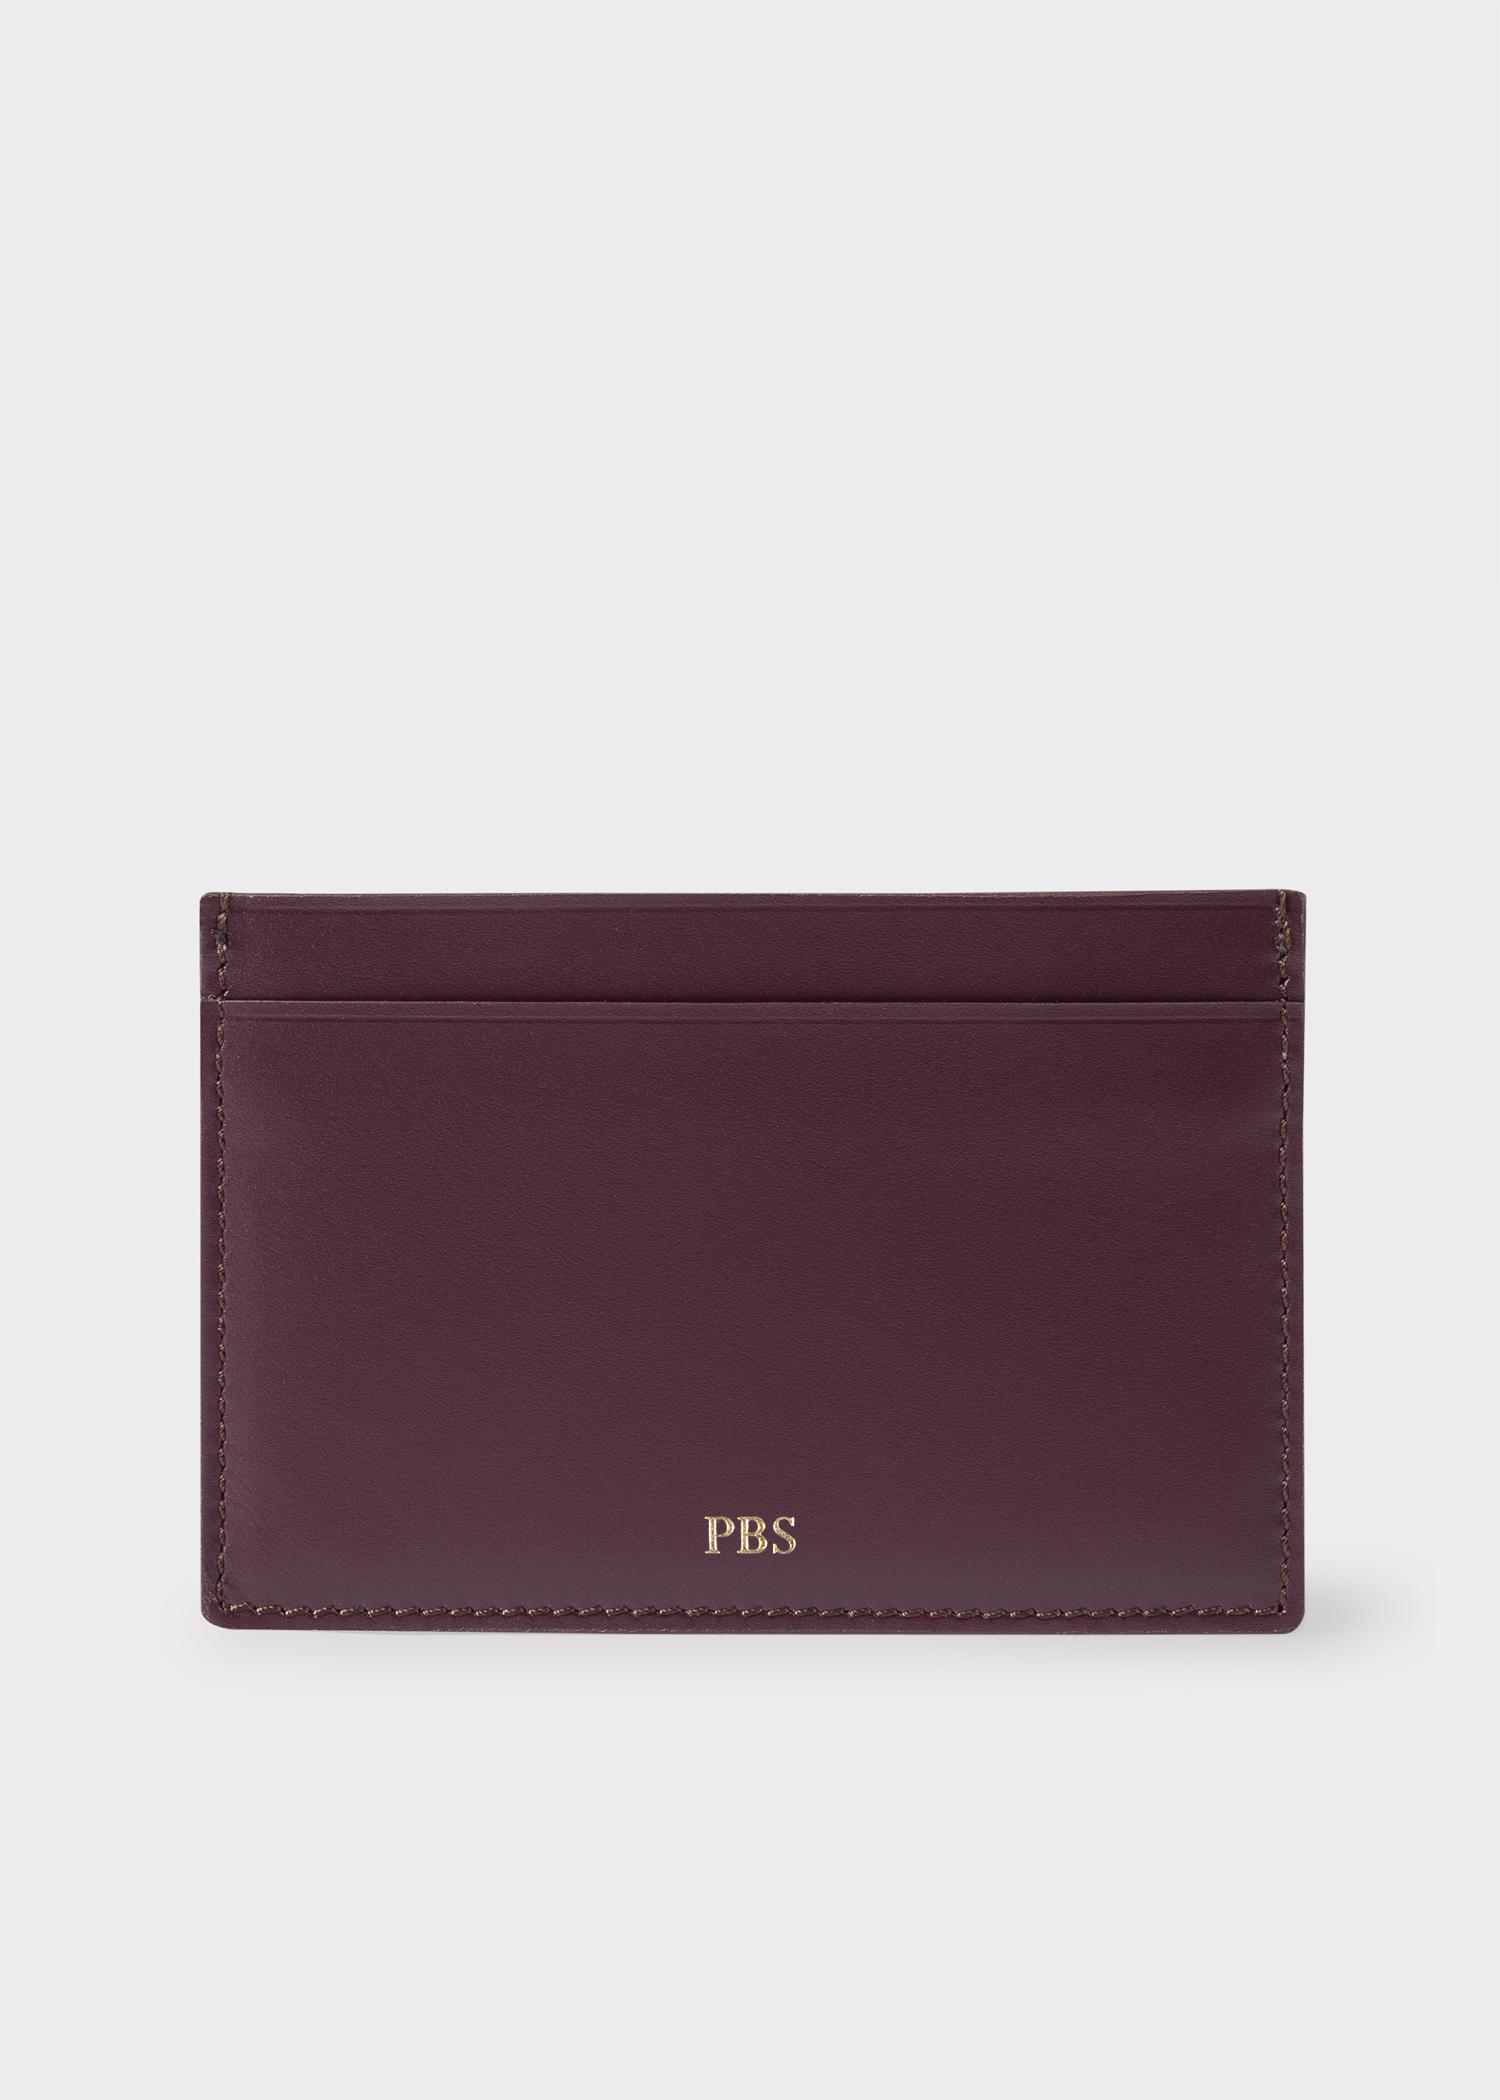 paul smith mens damson leather monogrammed credit card holder - Monogram Card Holder